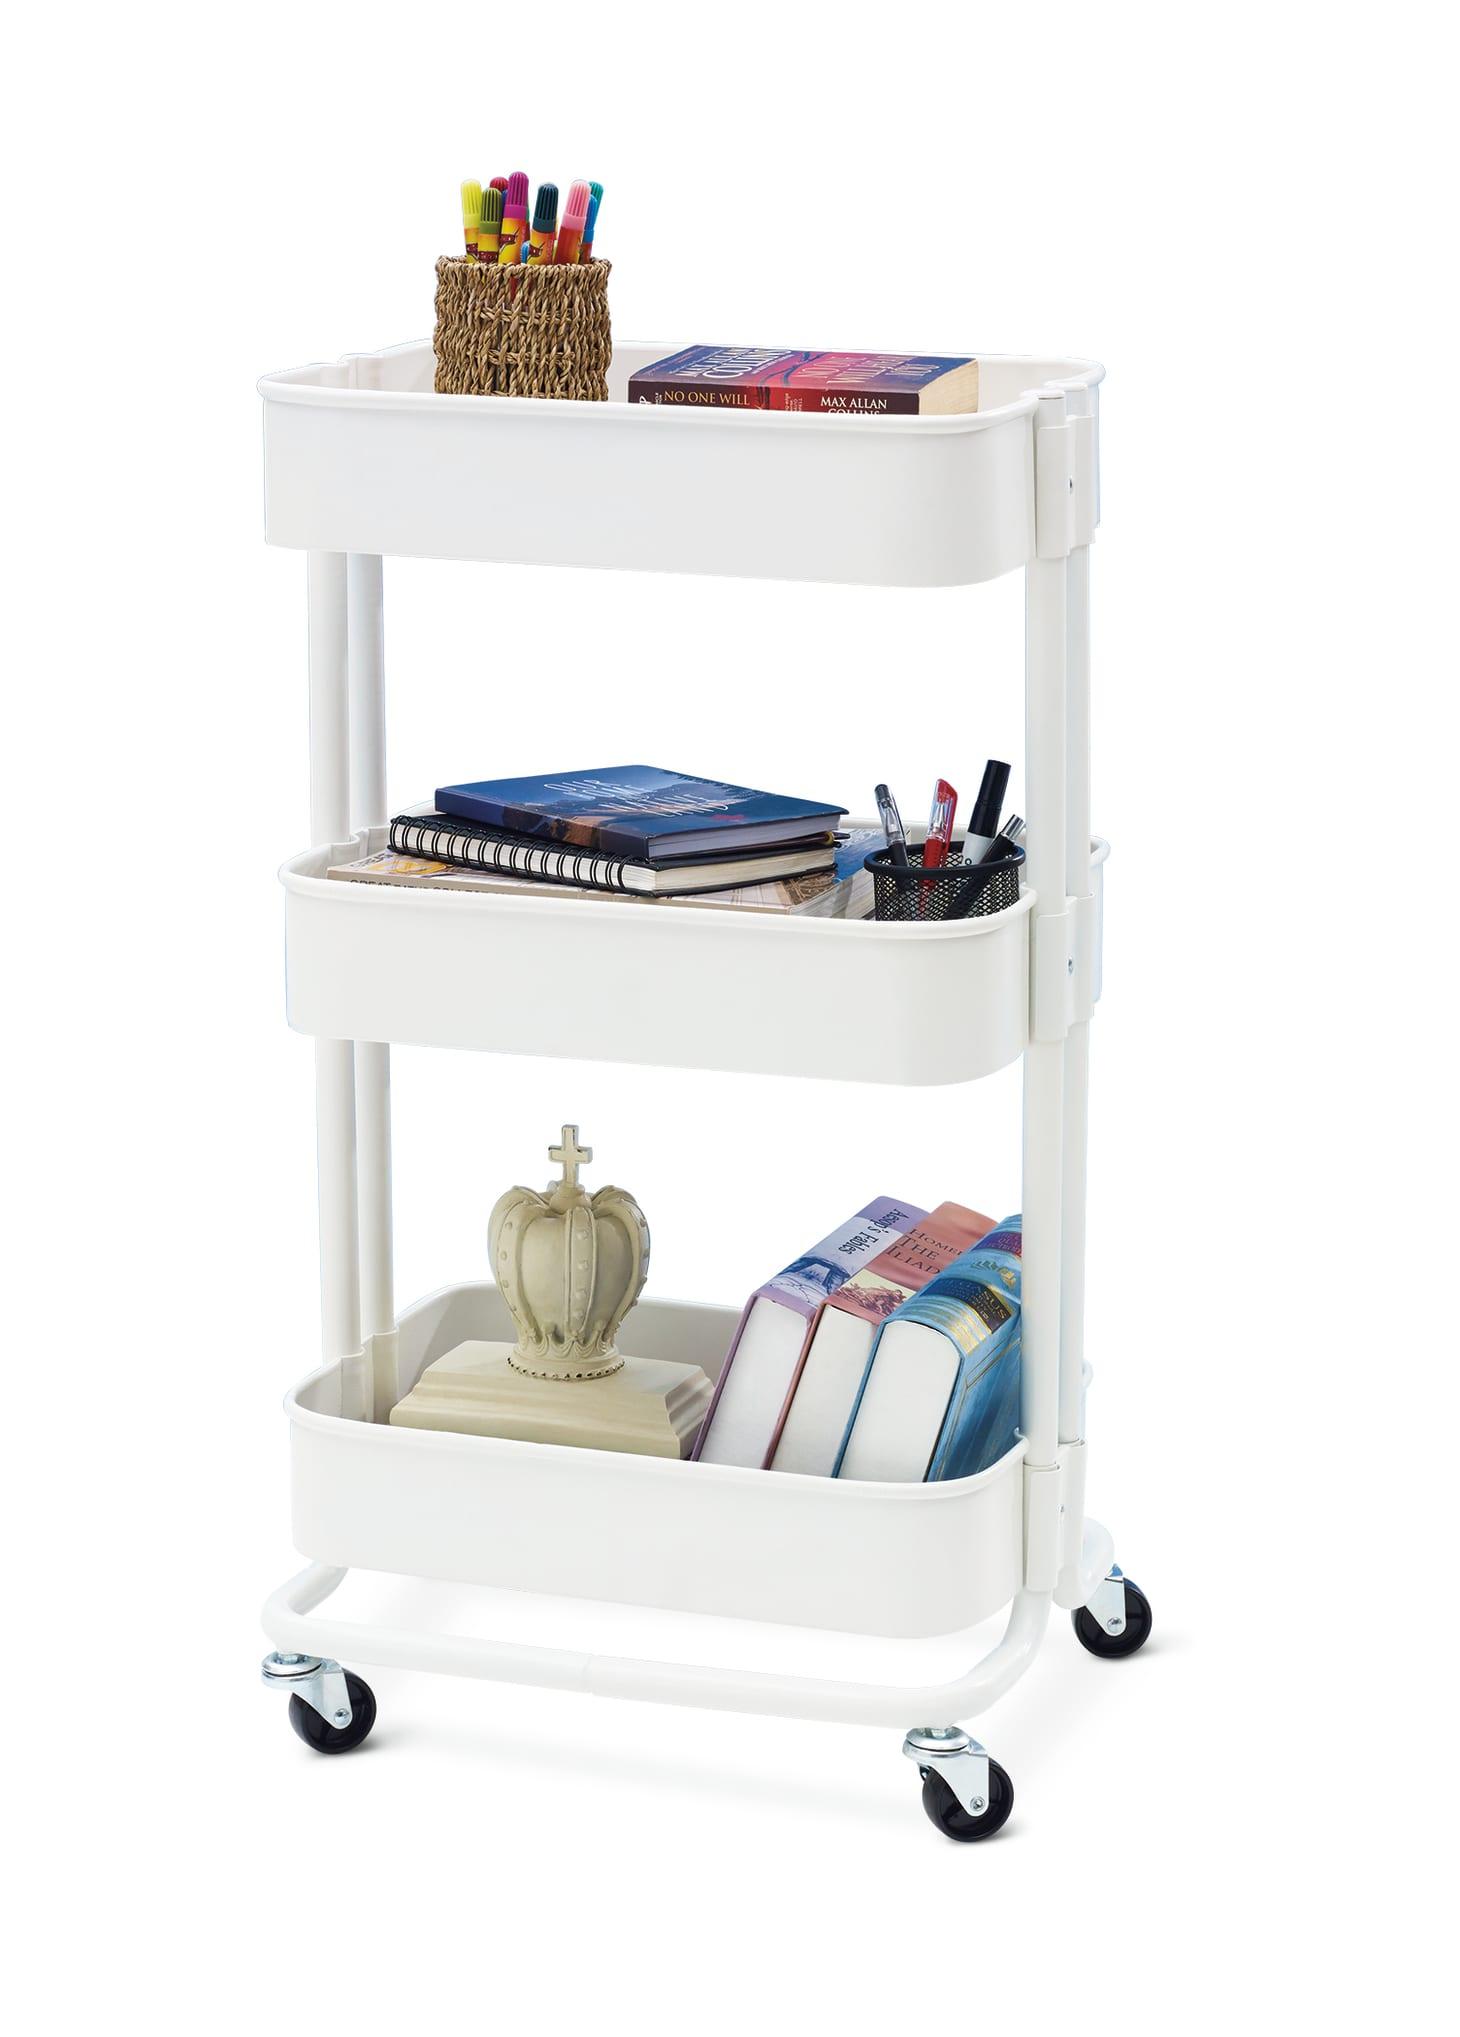 Ikea Raskog Cart Alternatives - Aldi Storage | Kitchn